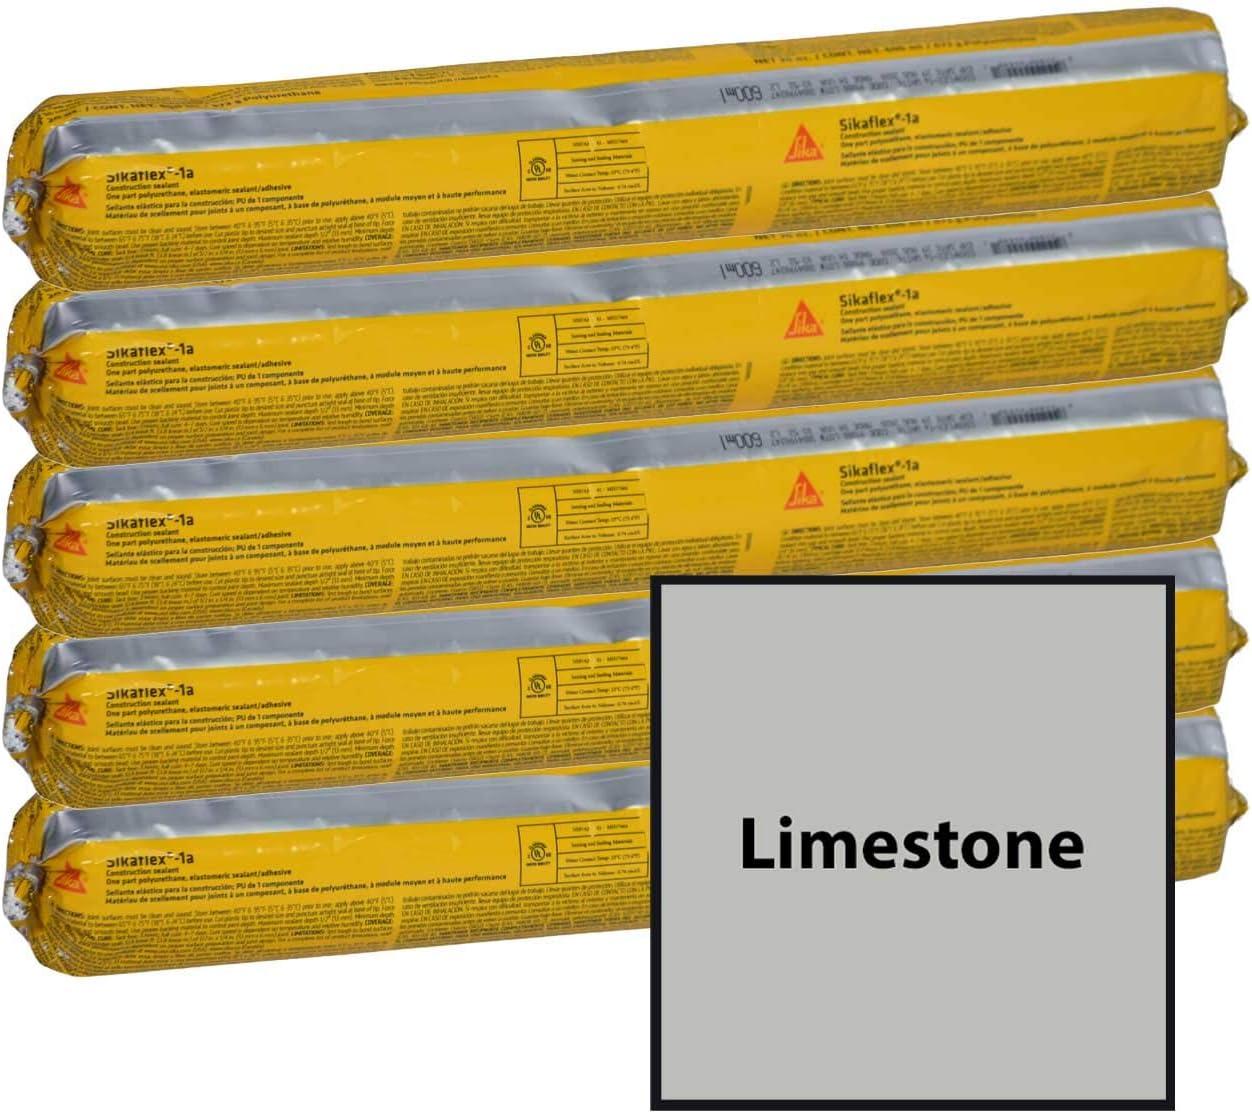 Black Sikaflex 1a Flexible Non Sag High Performance Polyurethane Concrete Masonry Sealant for Vertical and Horizontal Surfaces 5 20oz Tubes Quarter Case